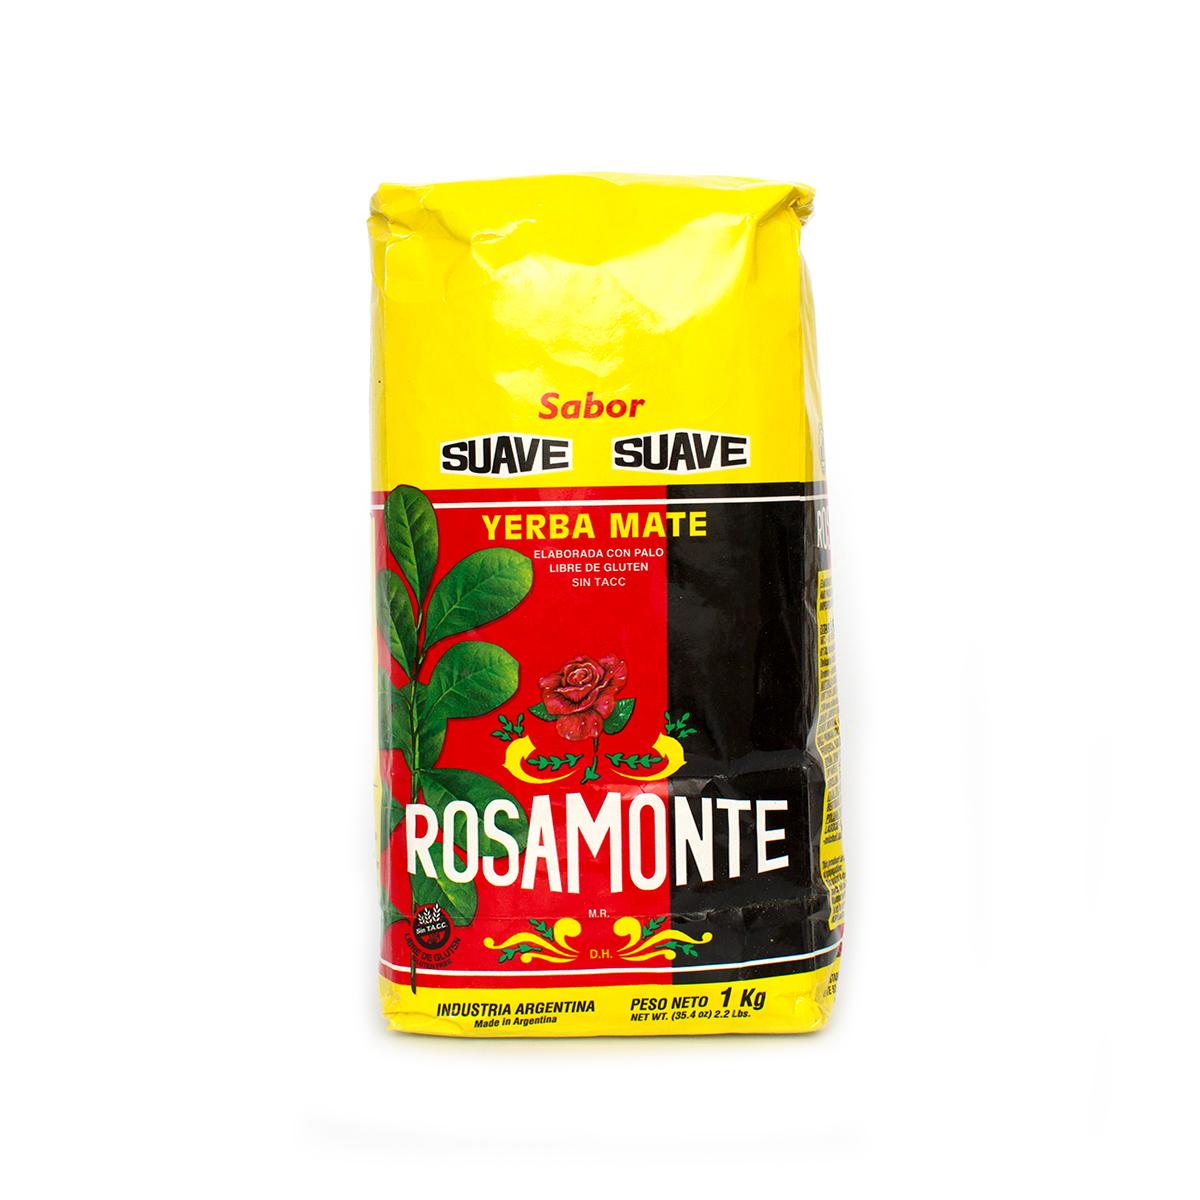 Мате Rosamonte Suave, 1000 г мате pipore especial 1000 г